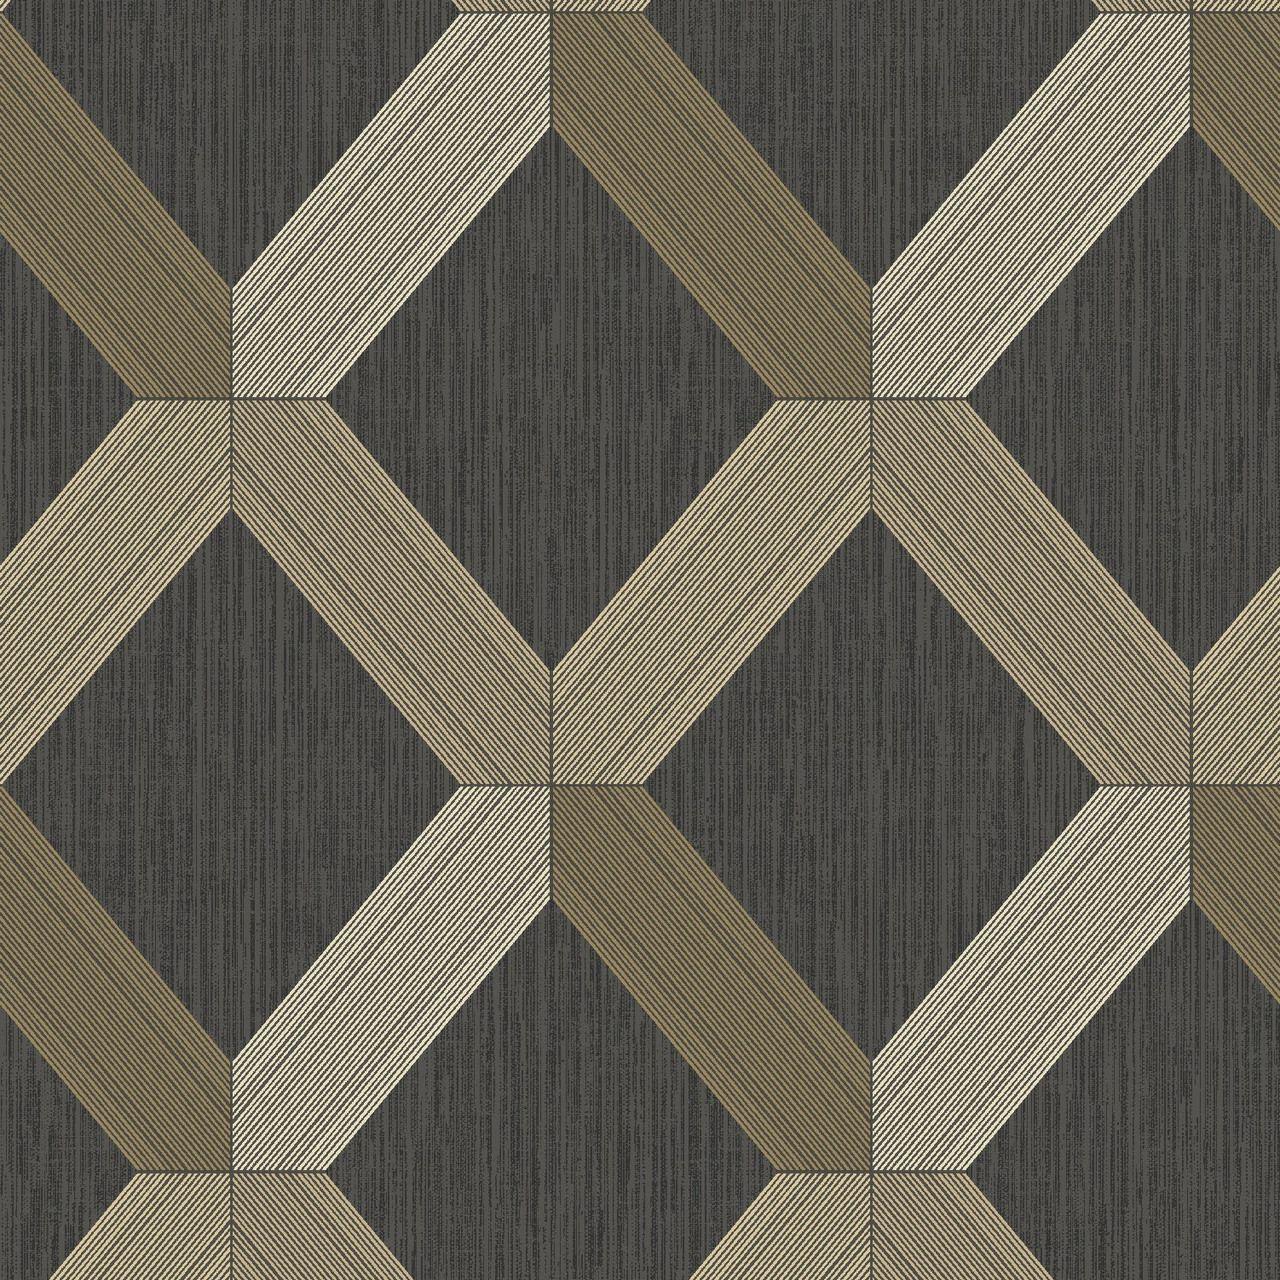 Lozenga Geometric Black Gold 75551 In 2020 Geometric Wallpaper Contemporary Wallpaper Albany Wallpaper